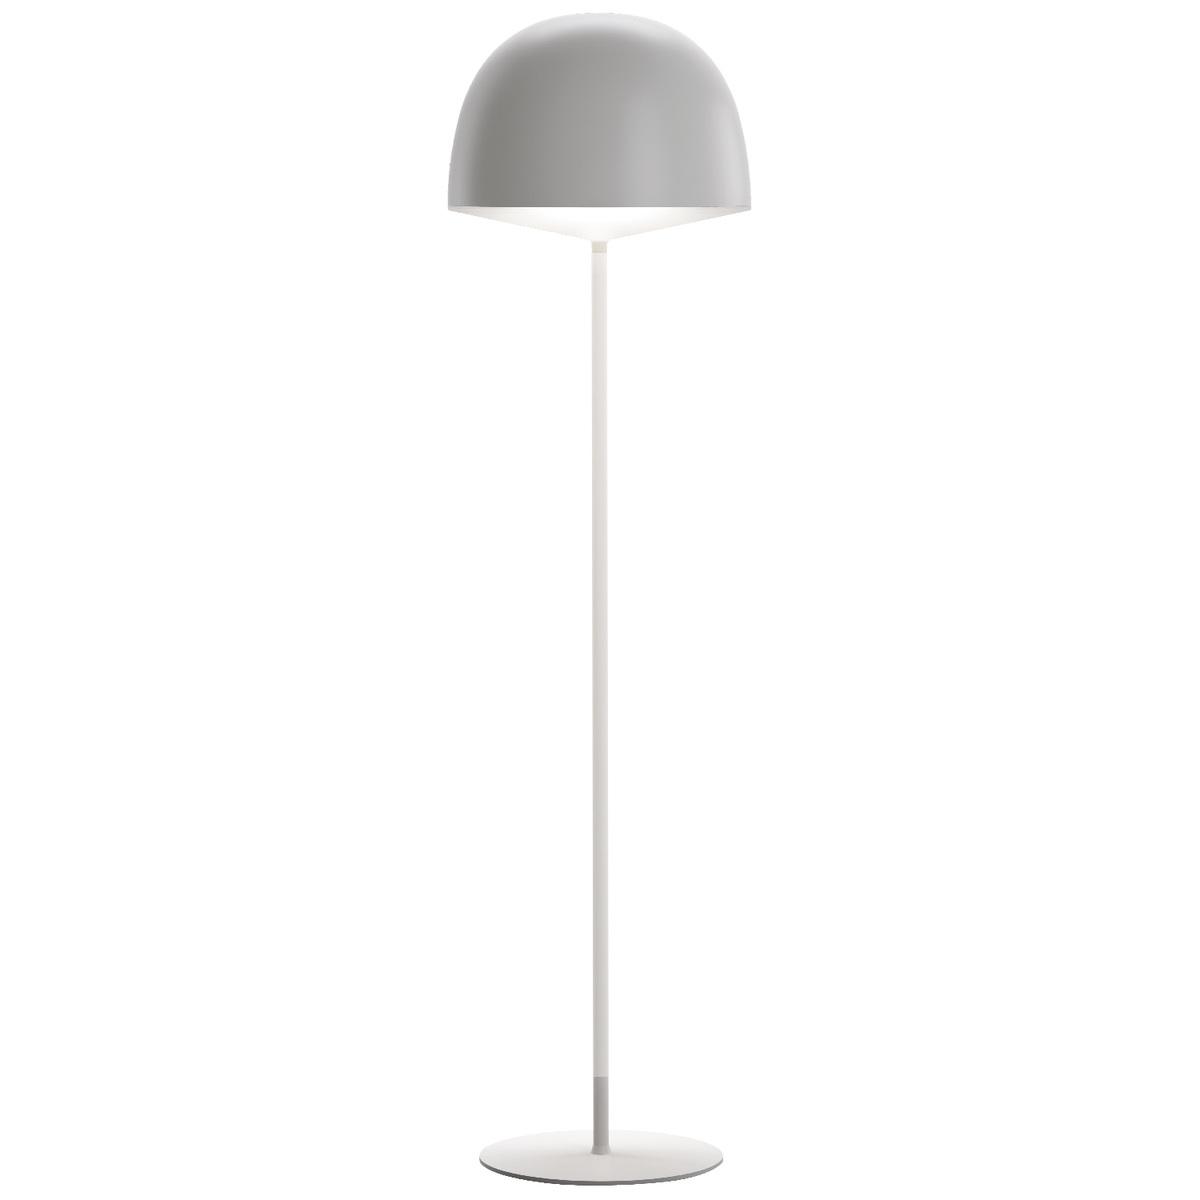 Fontanaarte Cheshire Floor Lamp, White